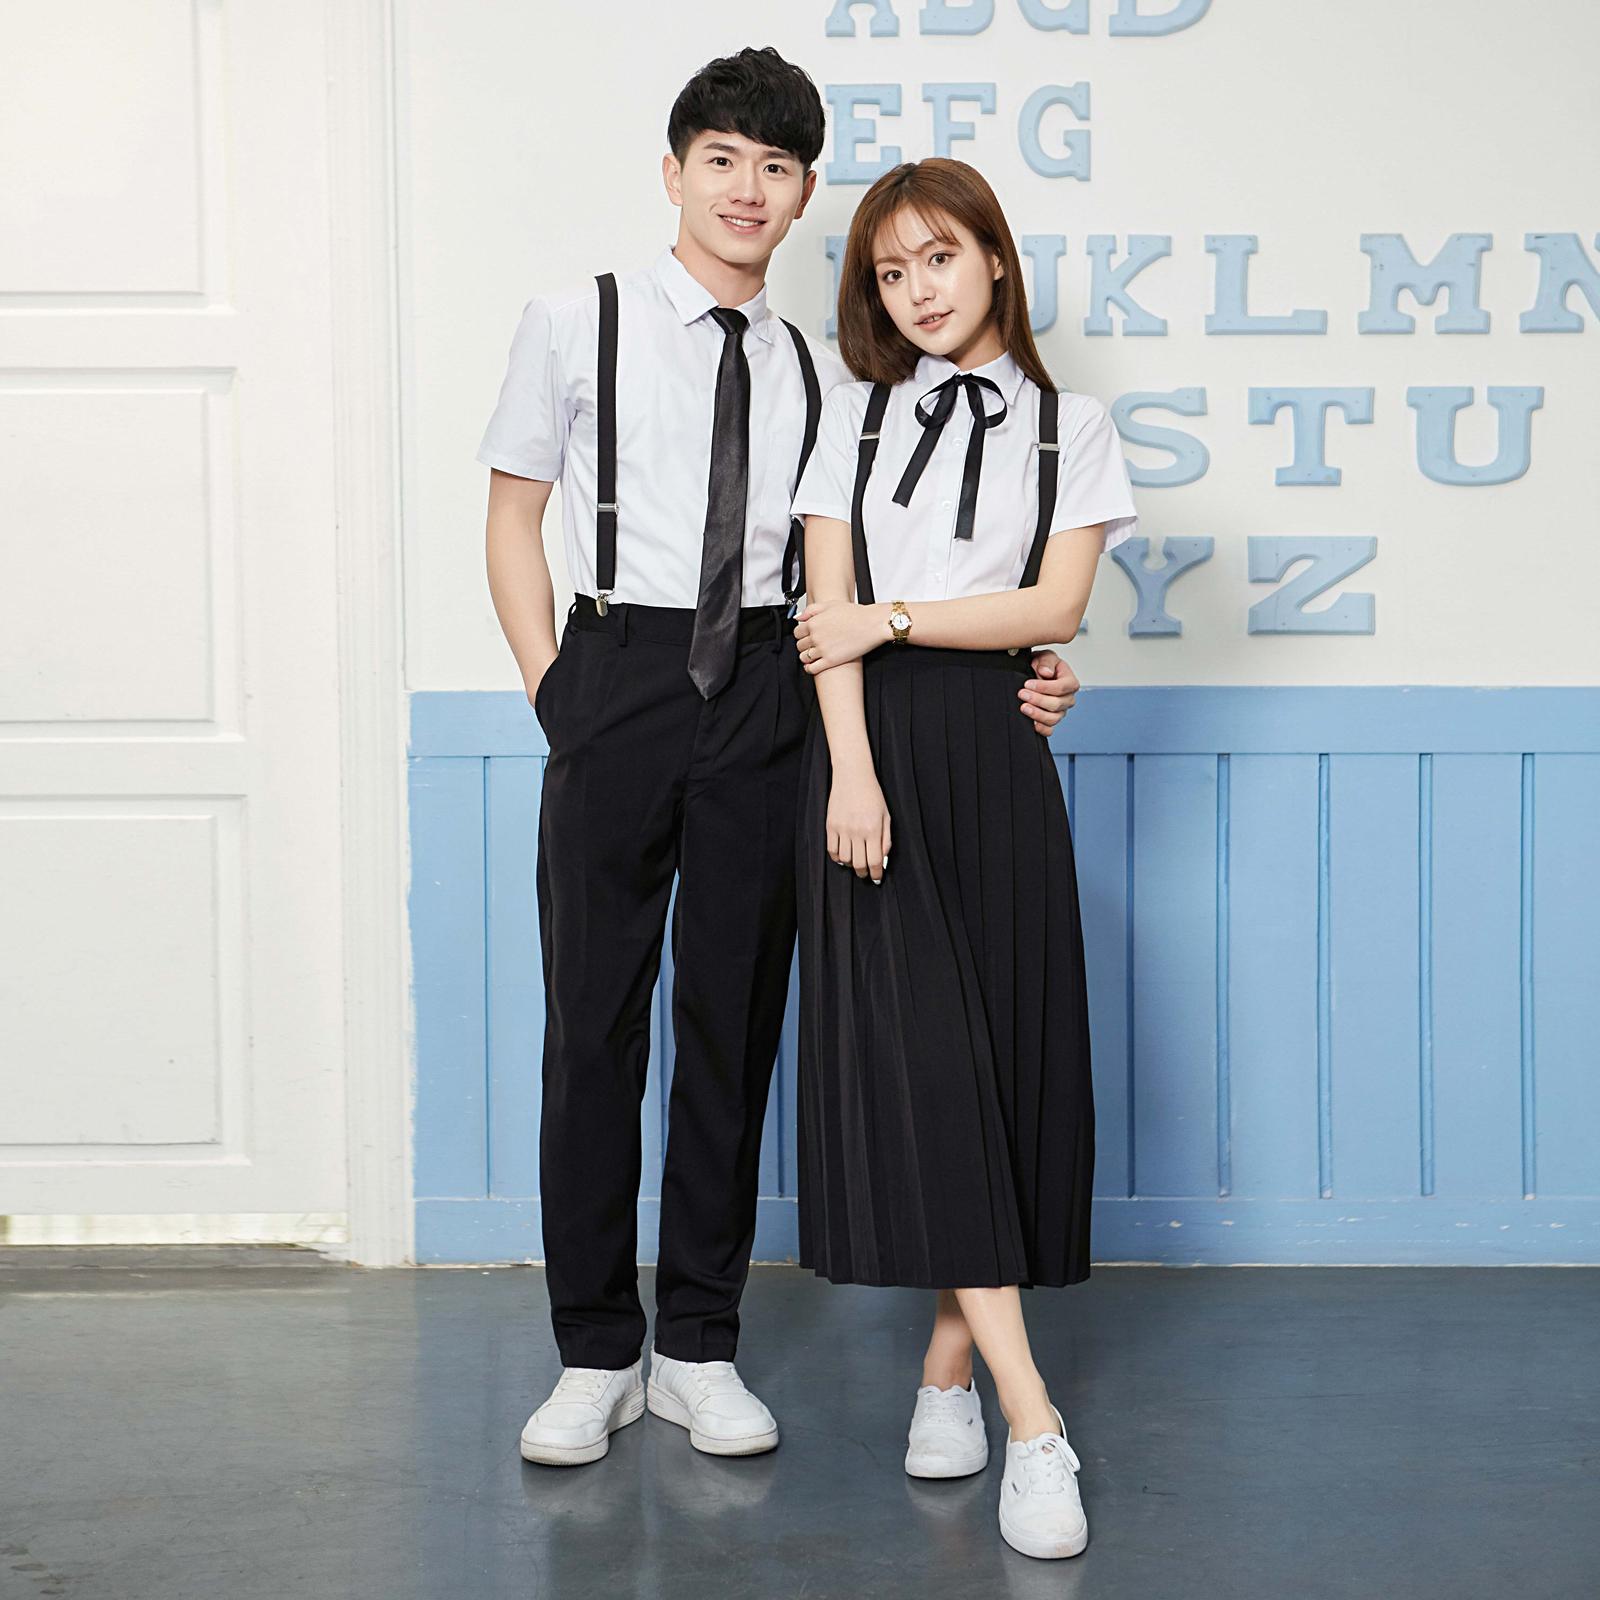 9028809dd6 Long Uniform Skirts For Juniors